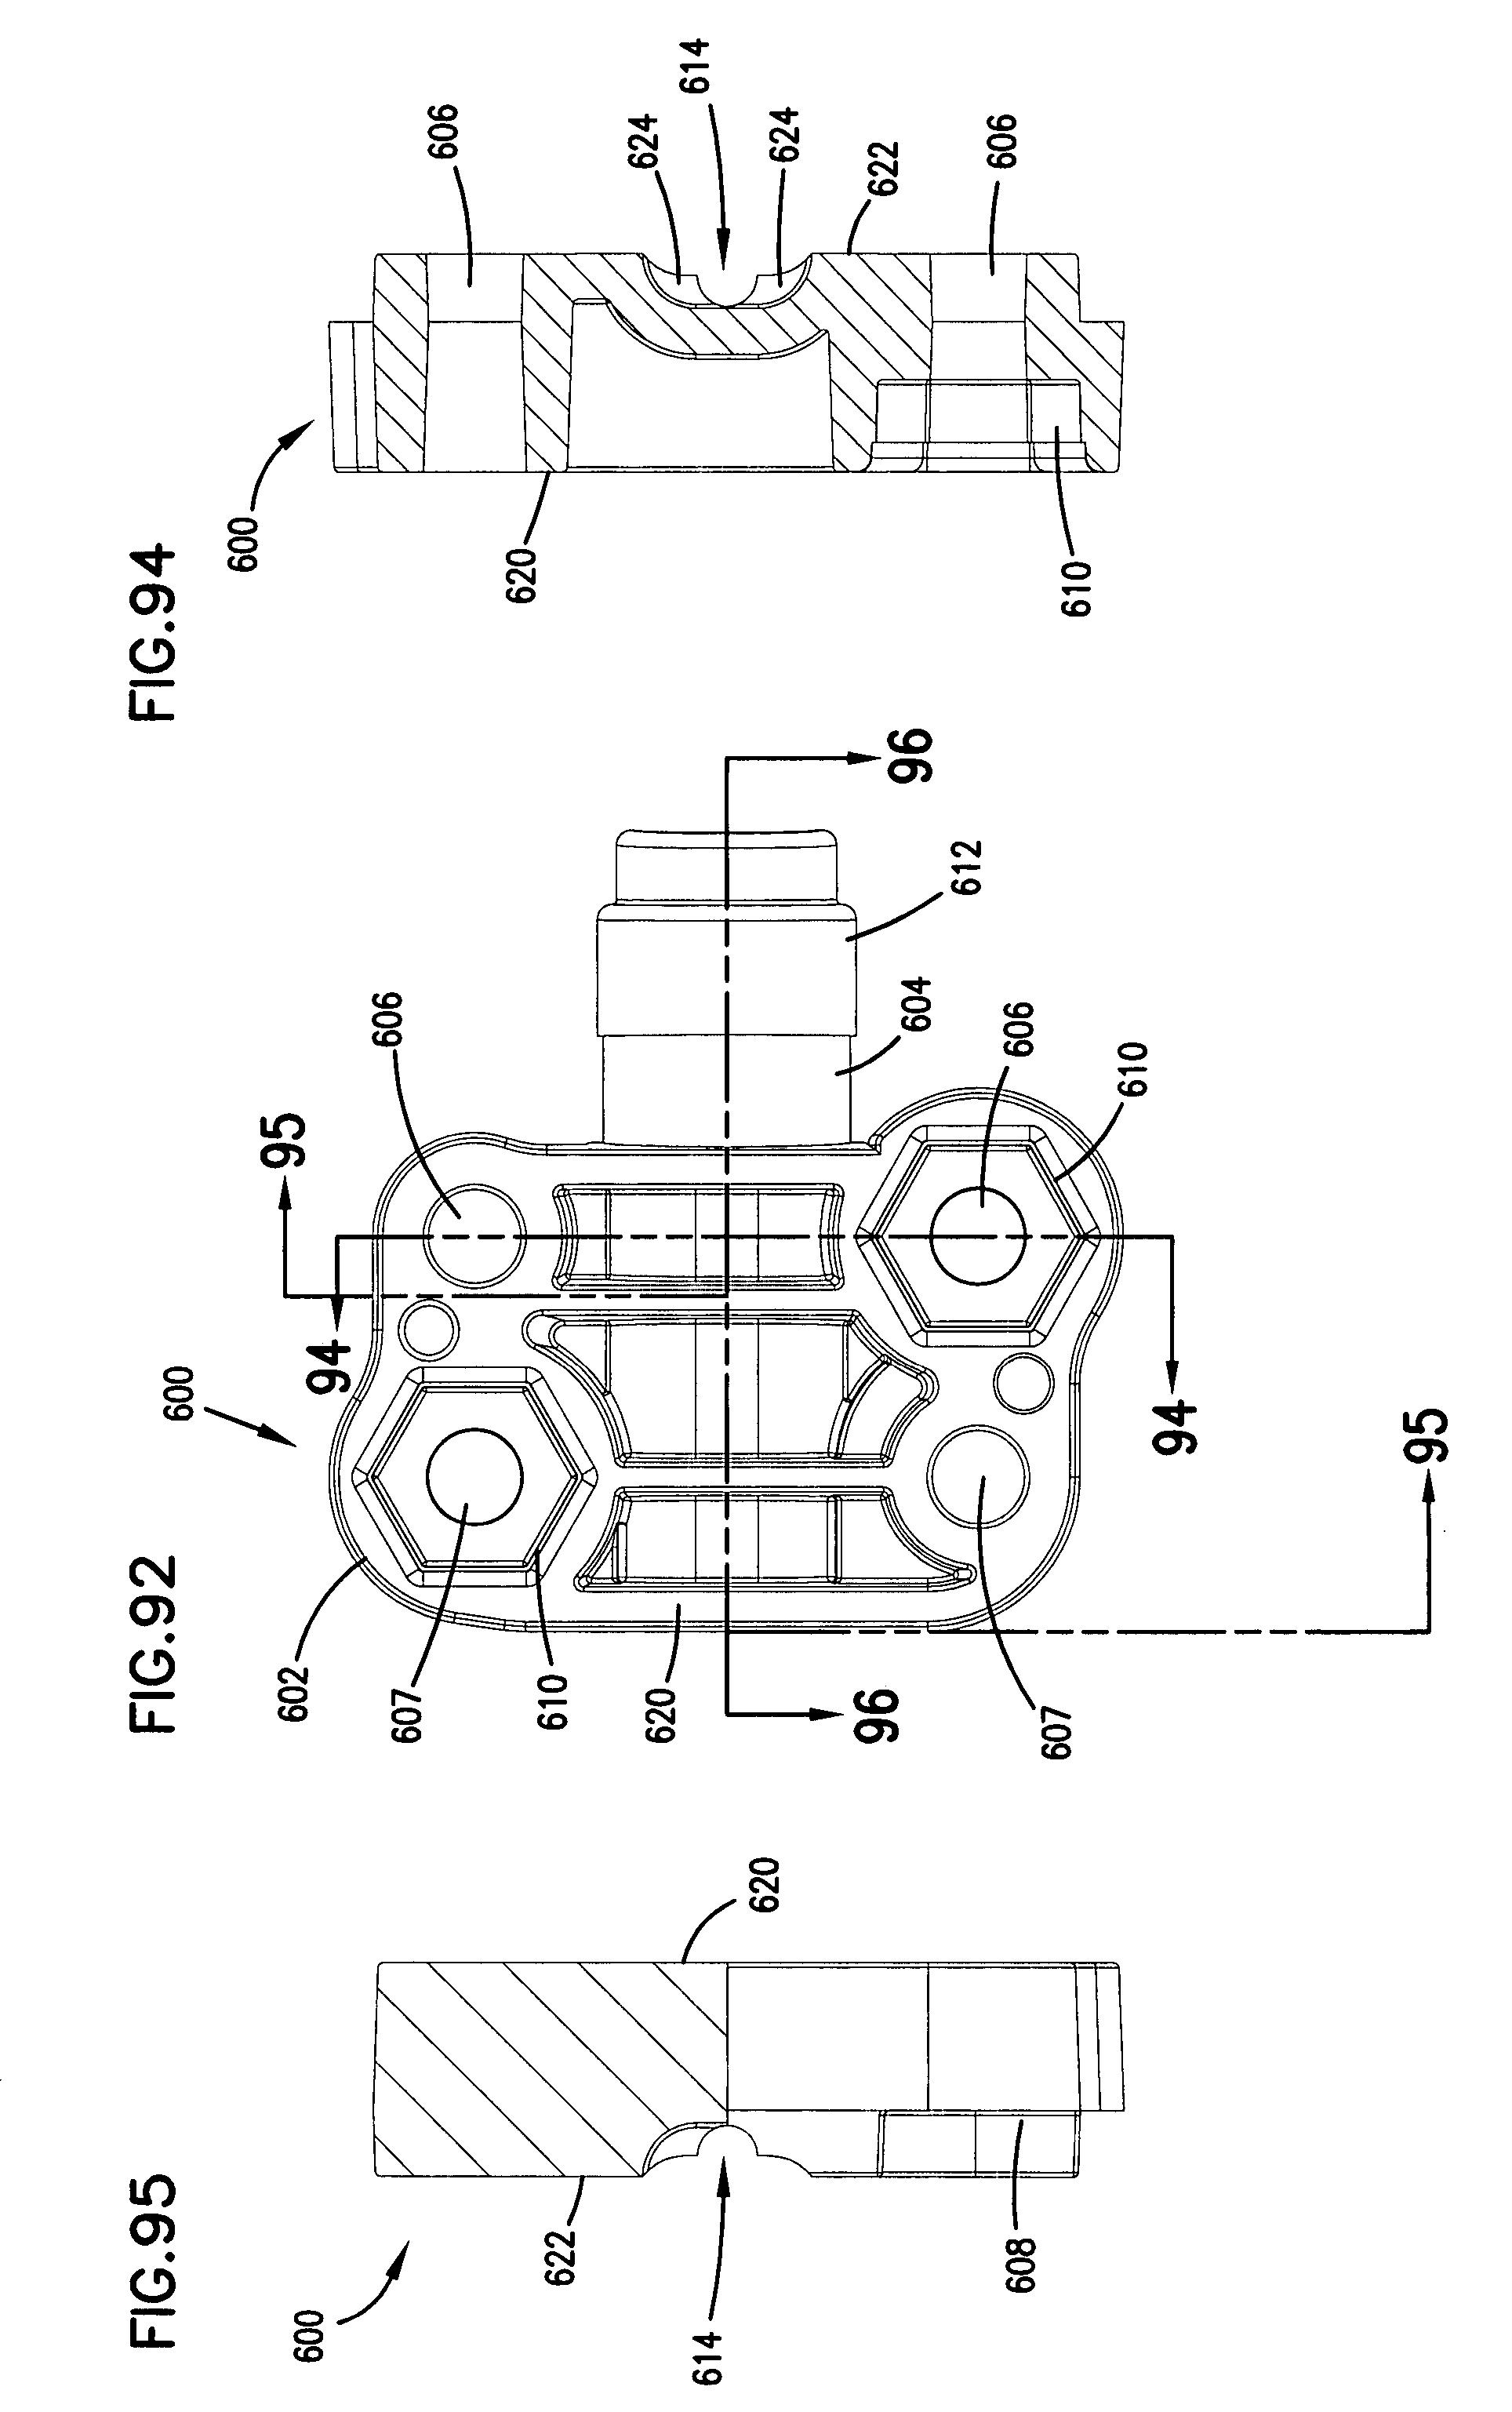 patent us7397997 - fiber access terminal